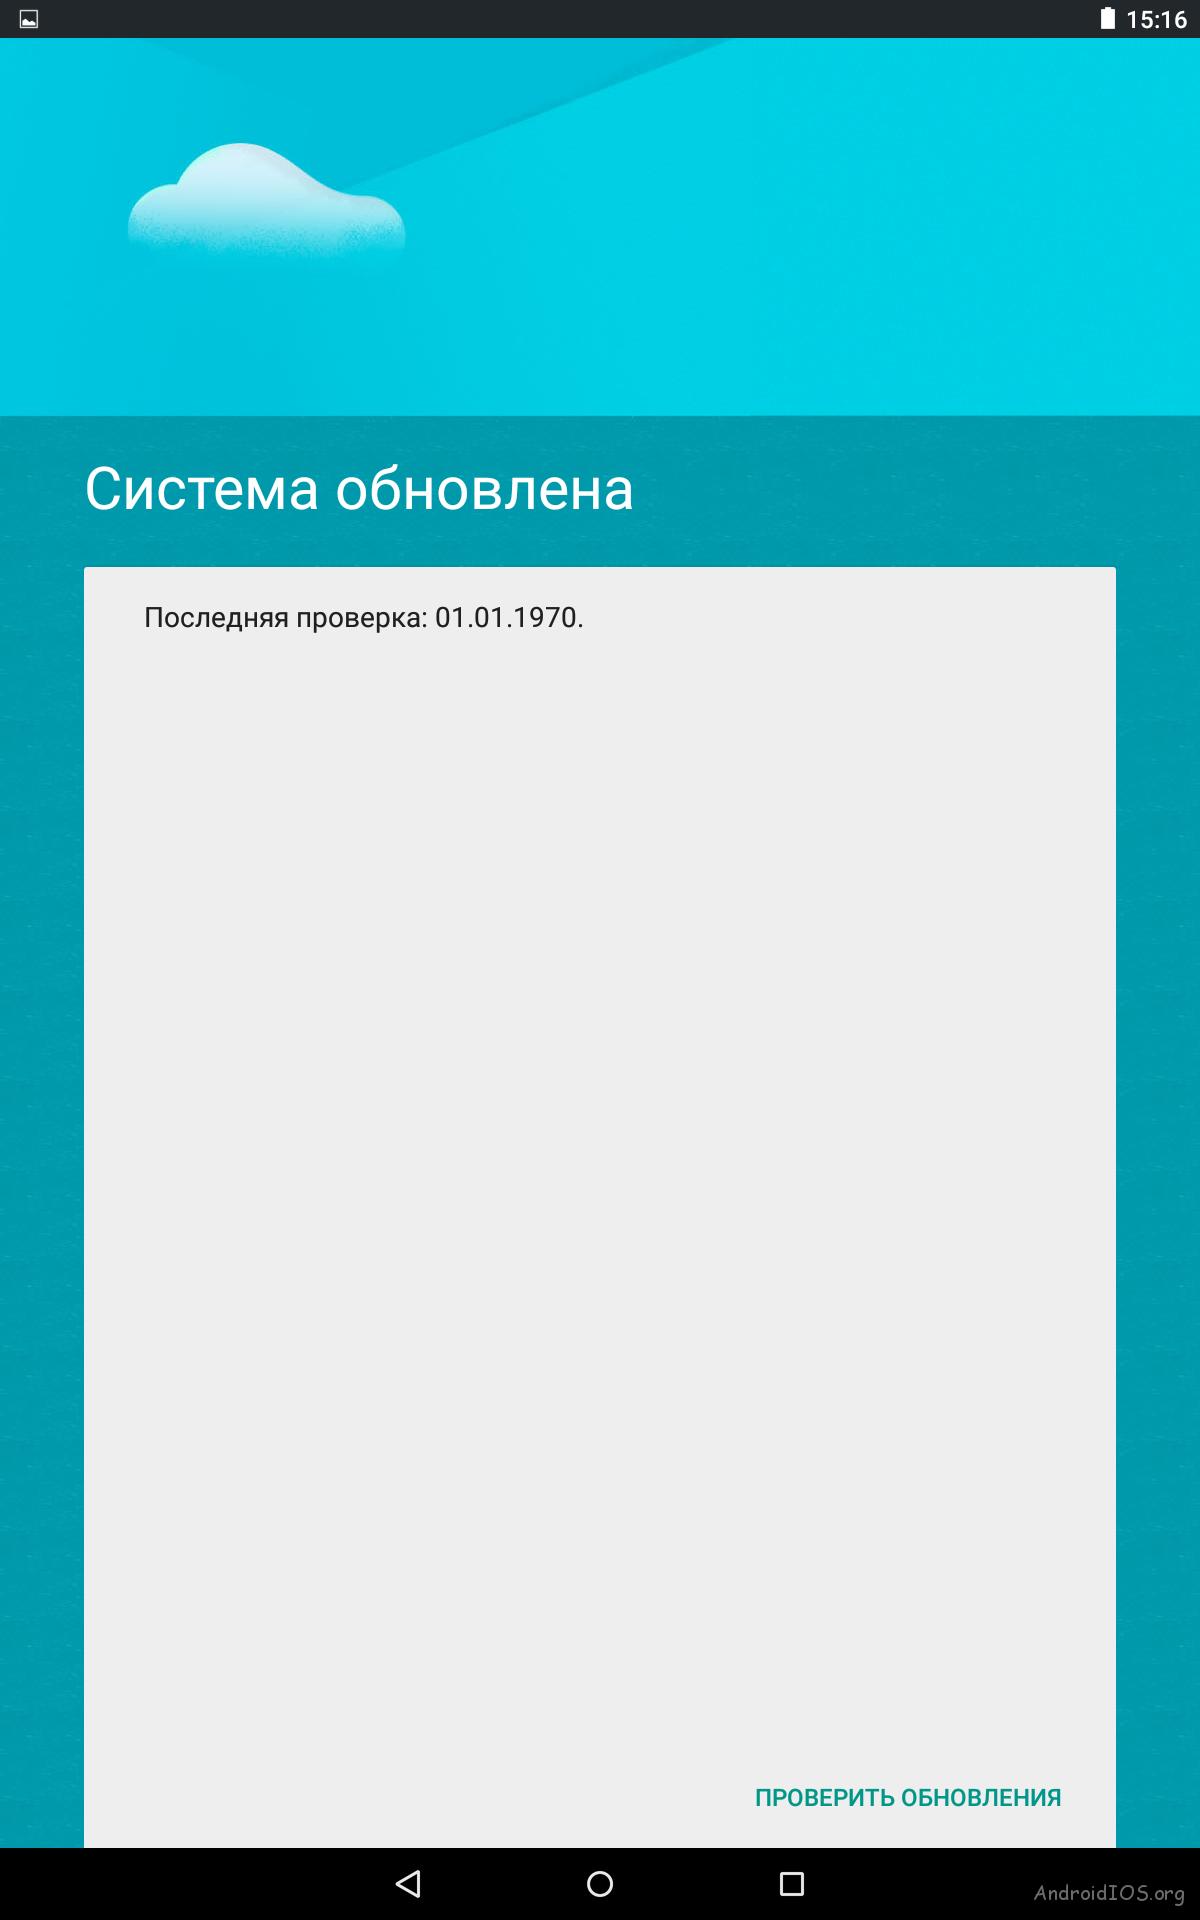 Screenshot_2016-05-10-15-16-46